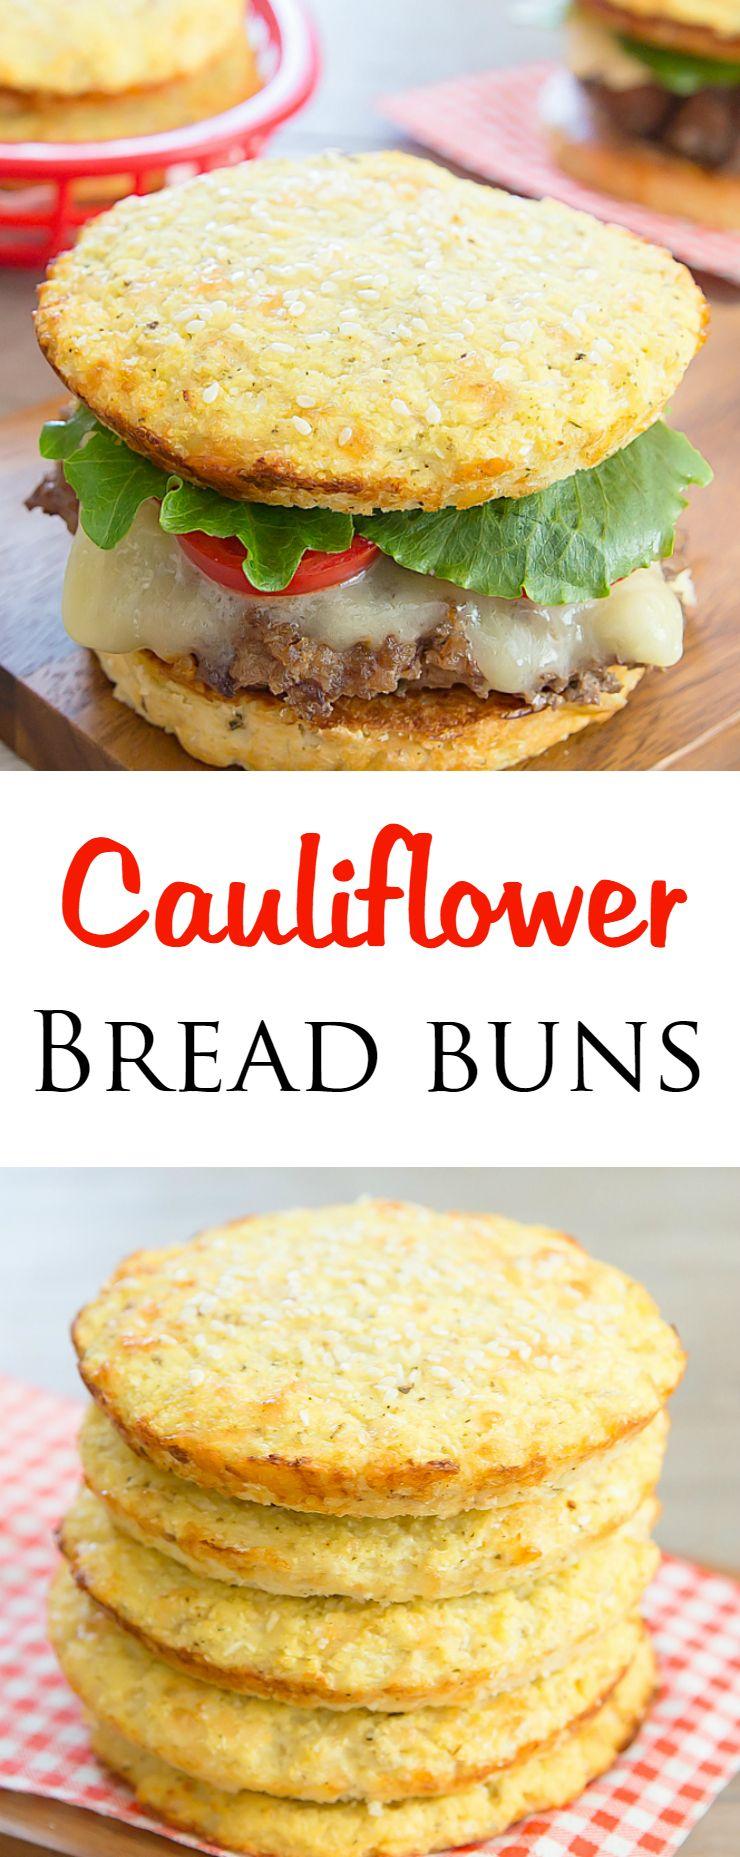 Cauliflower Bread Buns Recipe Low Carb Recipes Food Recipes